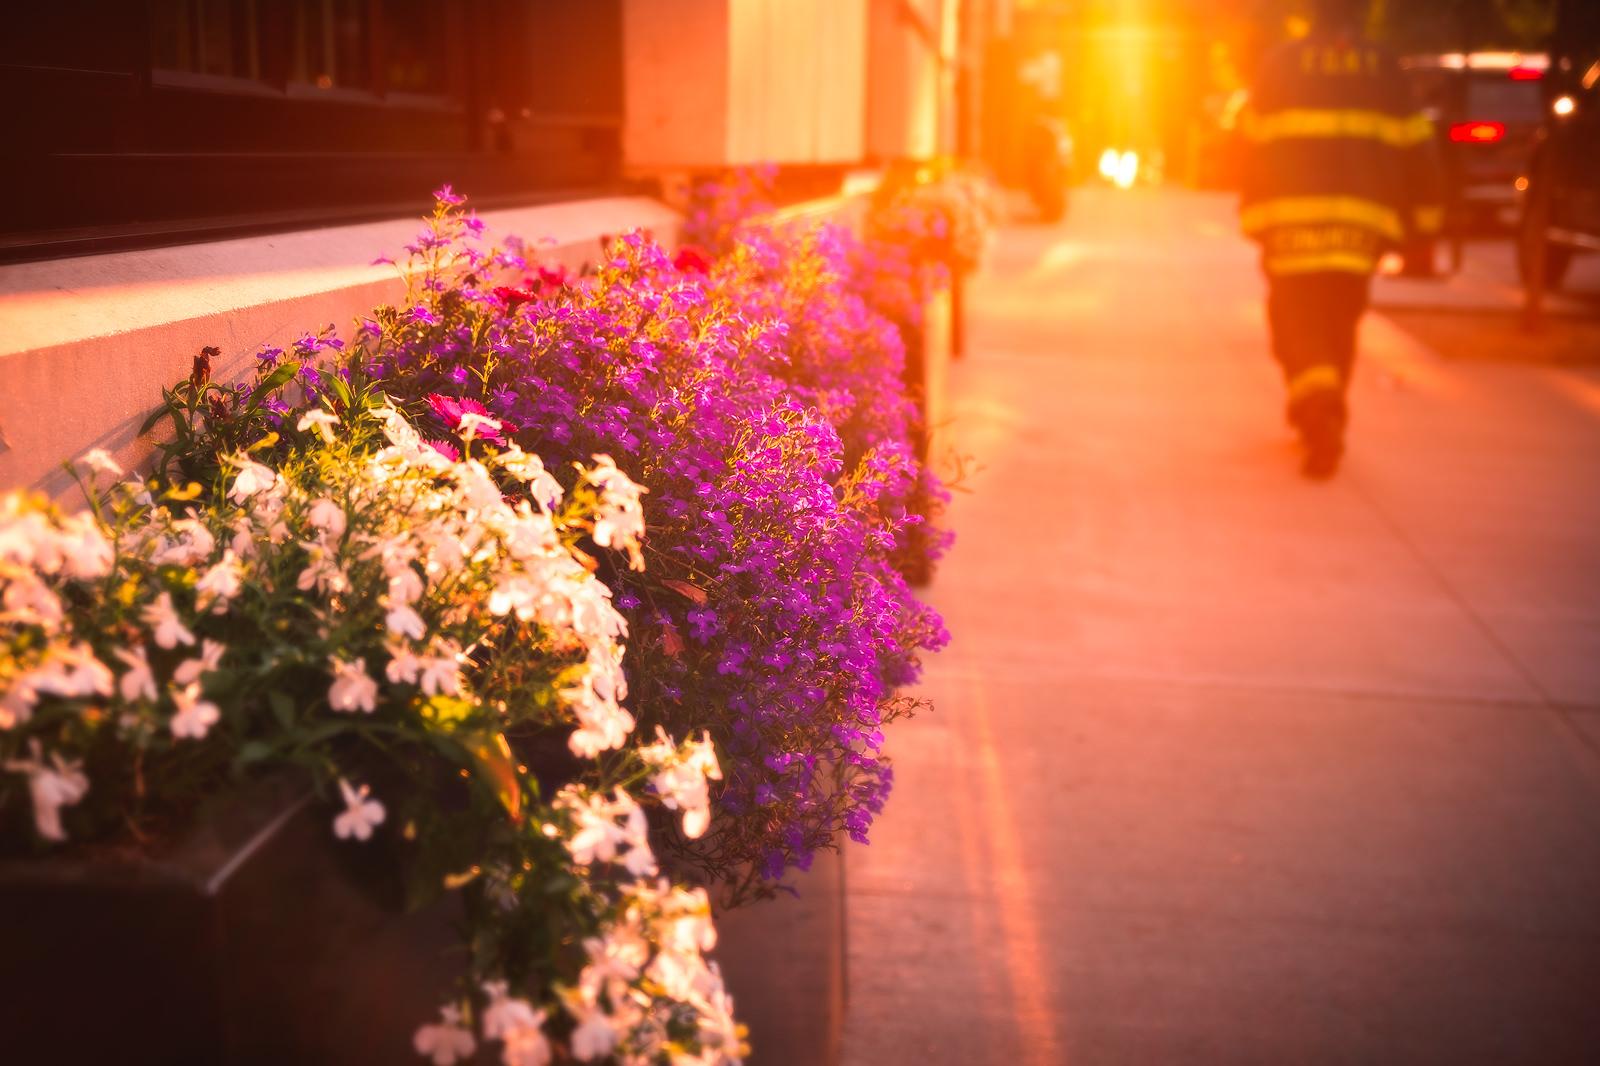 Limited edition, fine art, shot, sidewalks, New York City, firefighter, flower box, sunset, honor, firefighters, hero, flower, photo